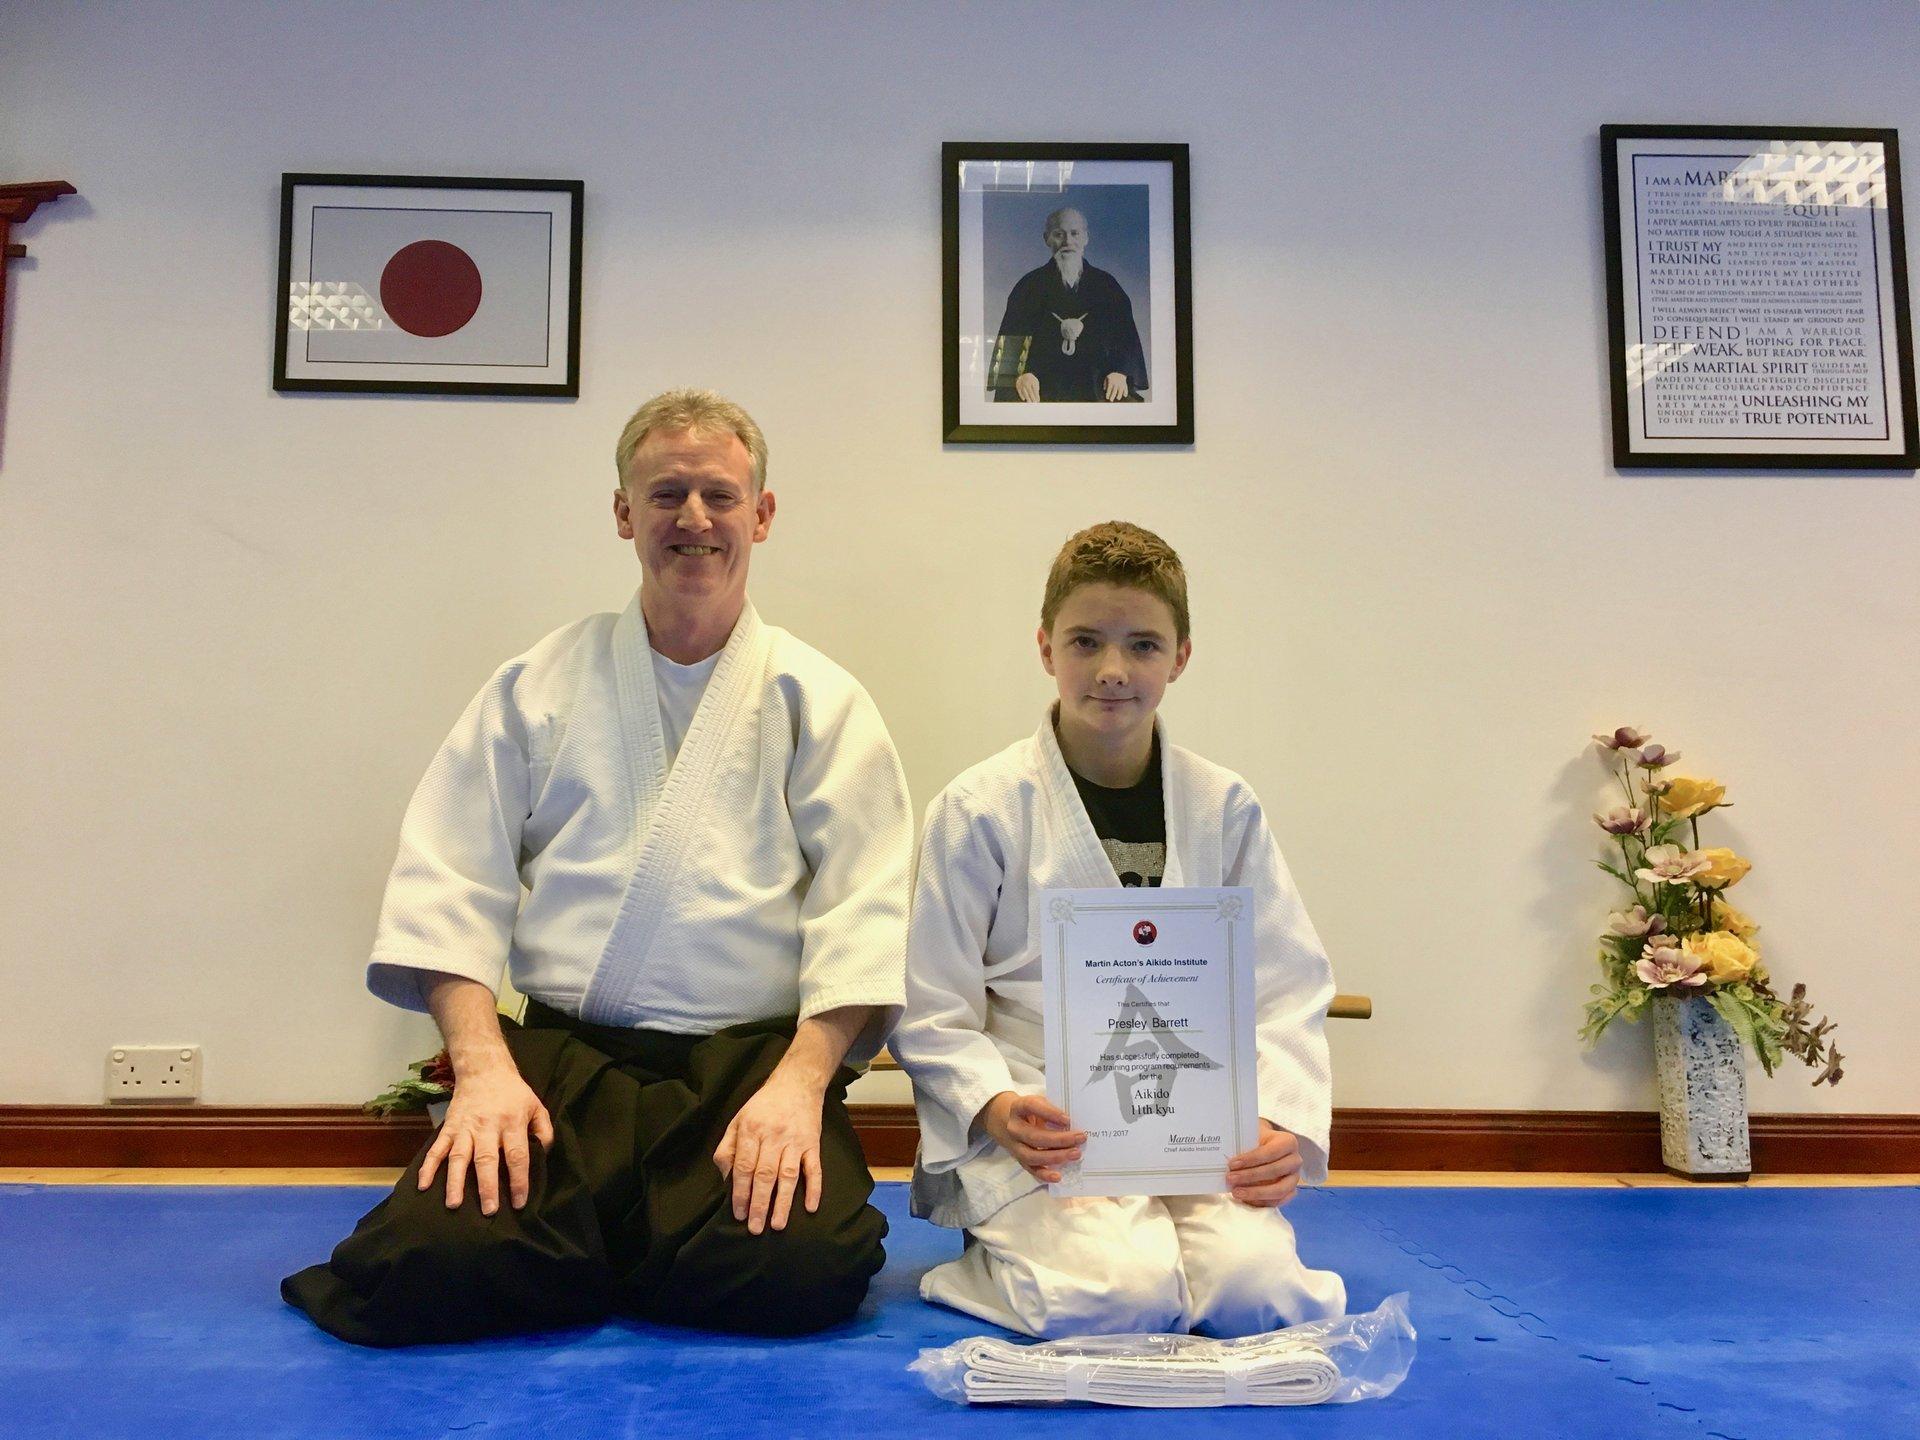 Presley Barrett recieving his Aikido 11th kyu grading with Martin Acton Sensei 28/11/2017 at Martin Acton's Aikido Institute.